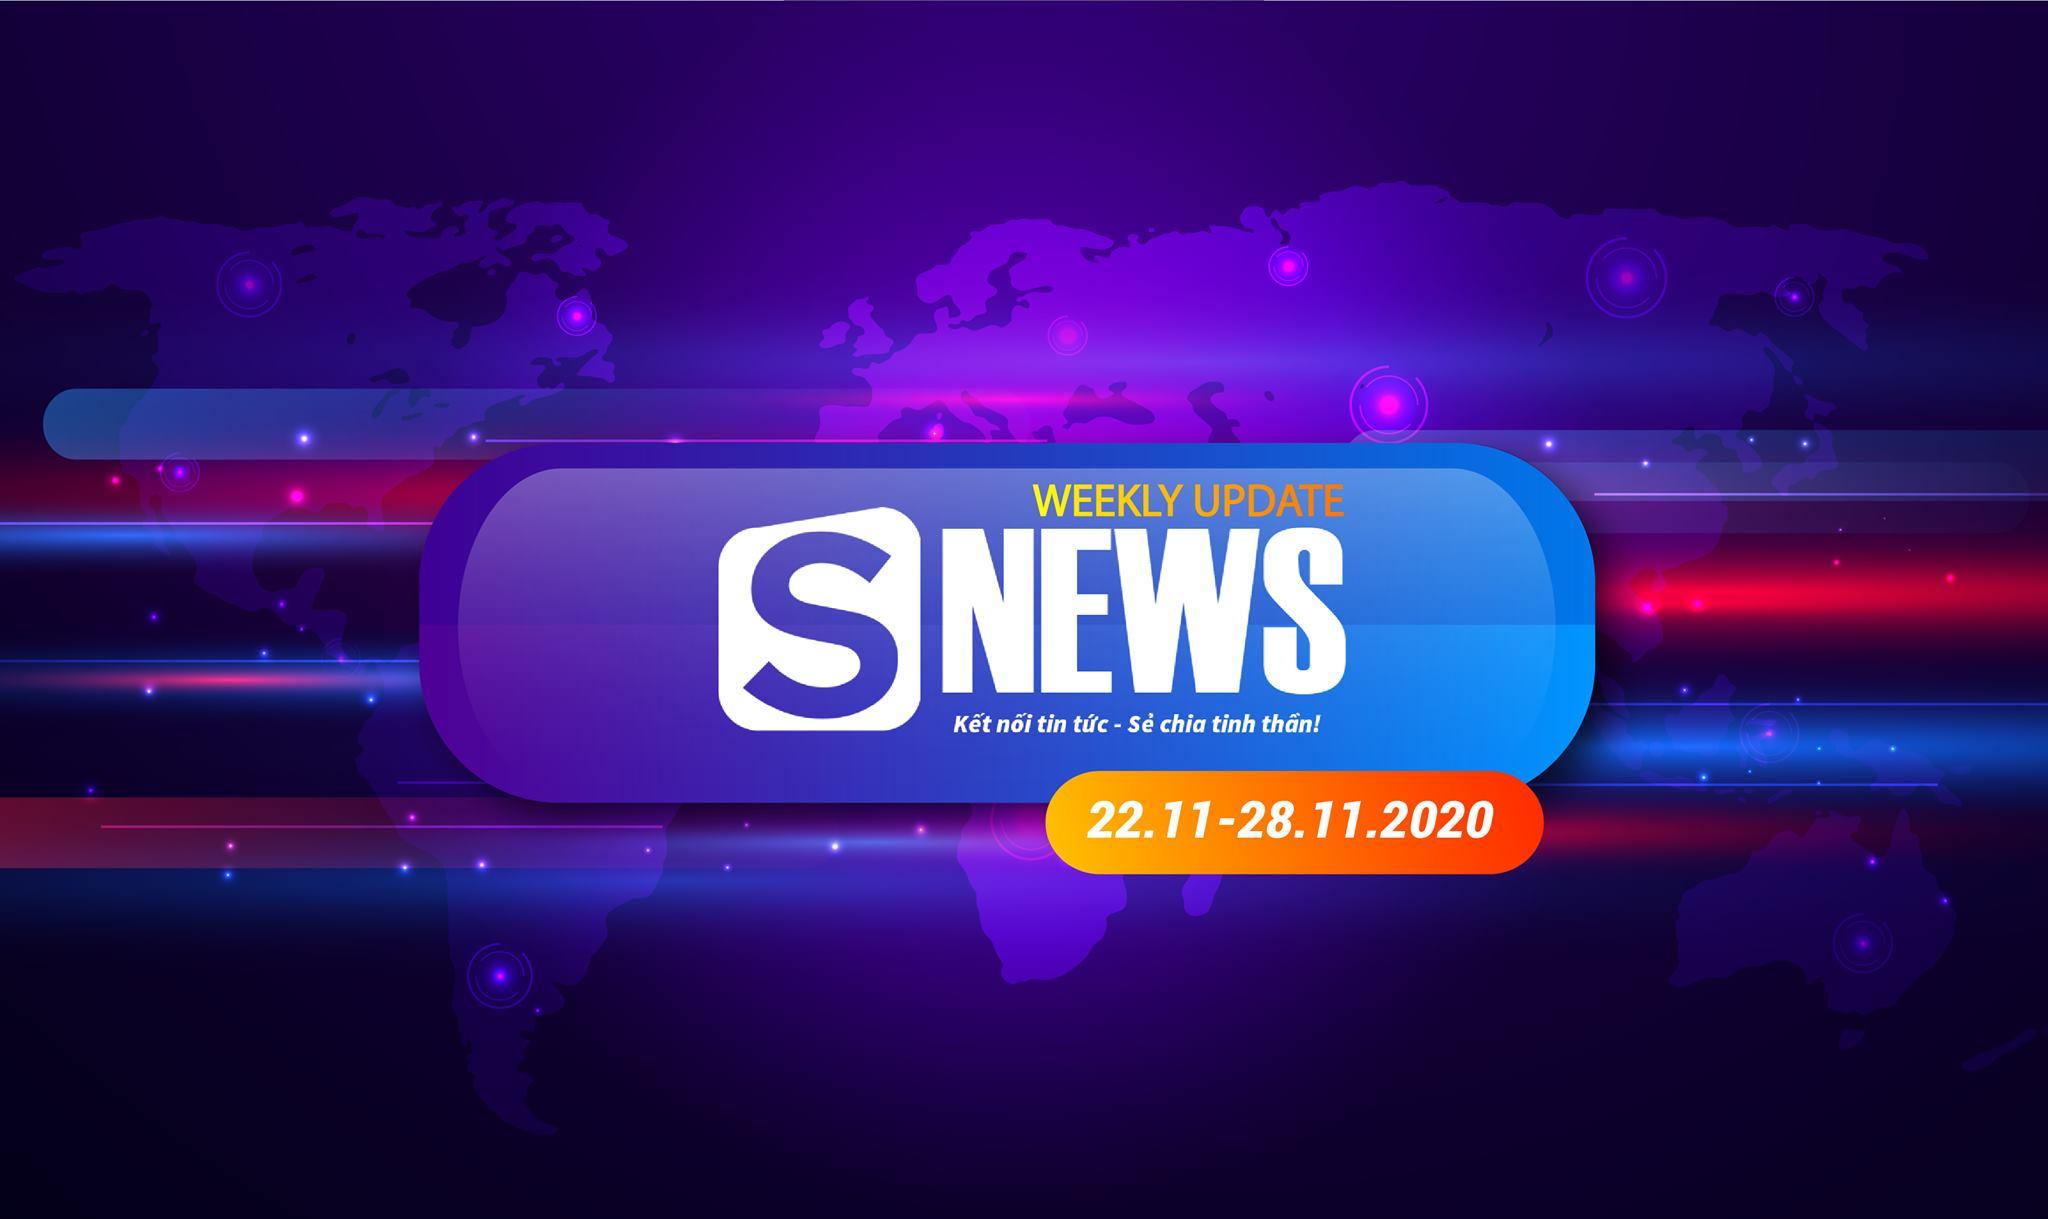 Tổng hợp tin tức Sapo tuần qua: 22.11 - 28.11.2020